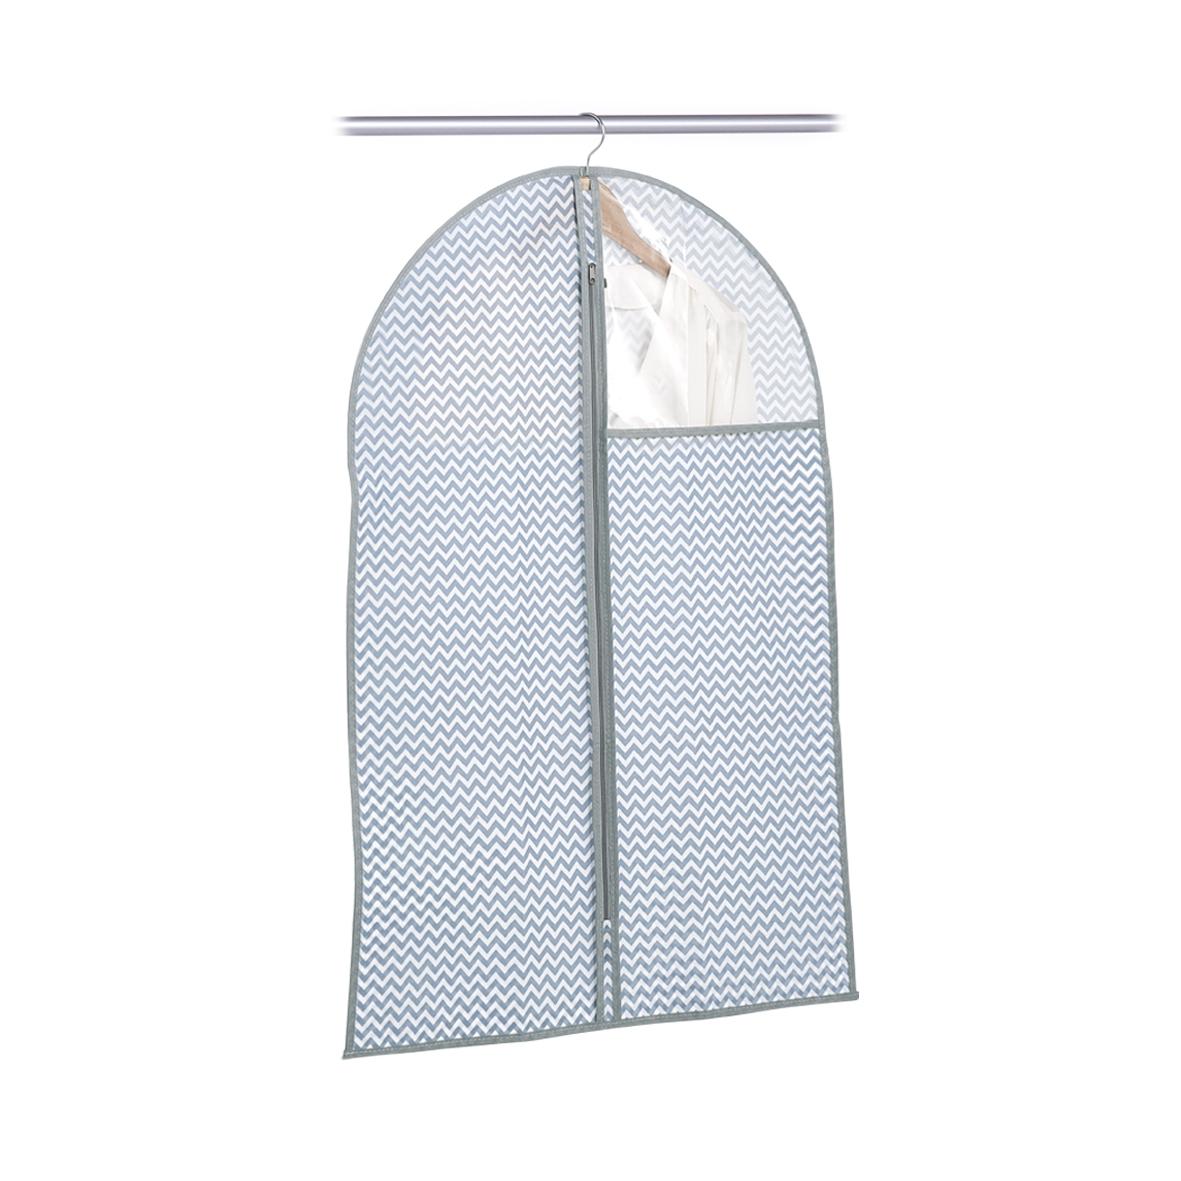 Husa textila pentru haine cu fermoar, Alb / Gri Zig Zag, l60xH90 cm